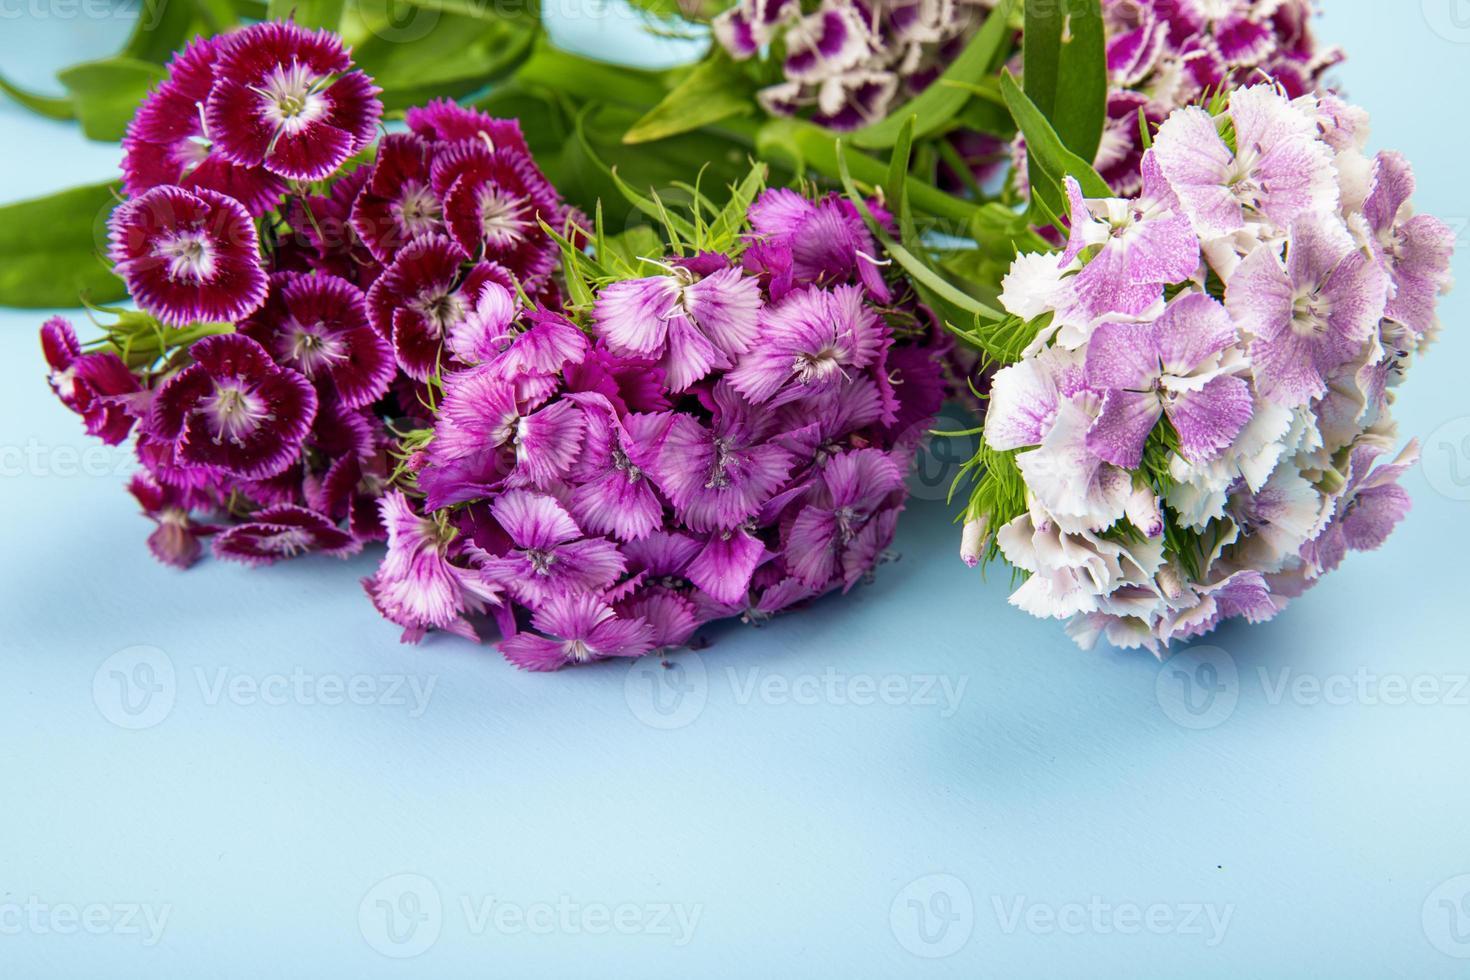 flores de color púrpura sobre un fondo azul foto